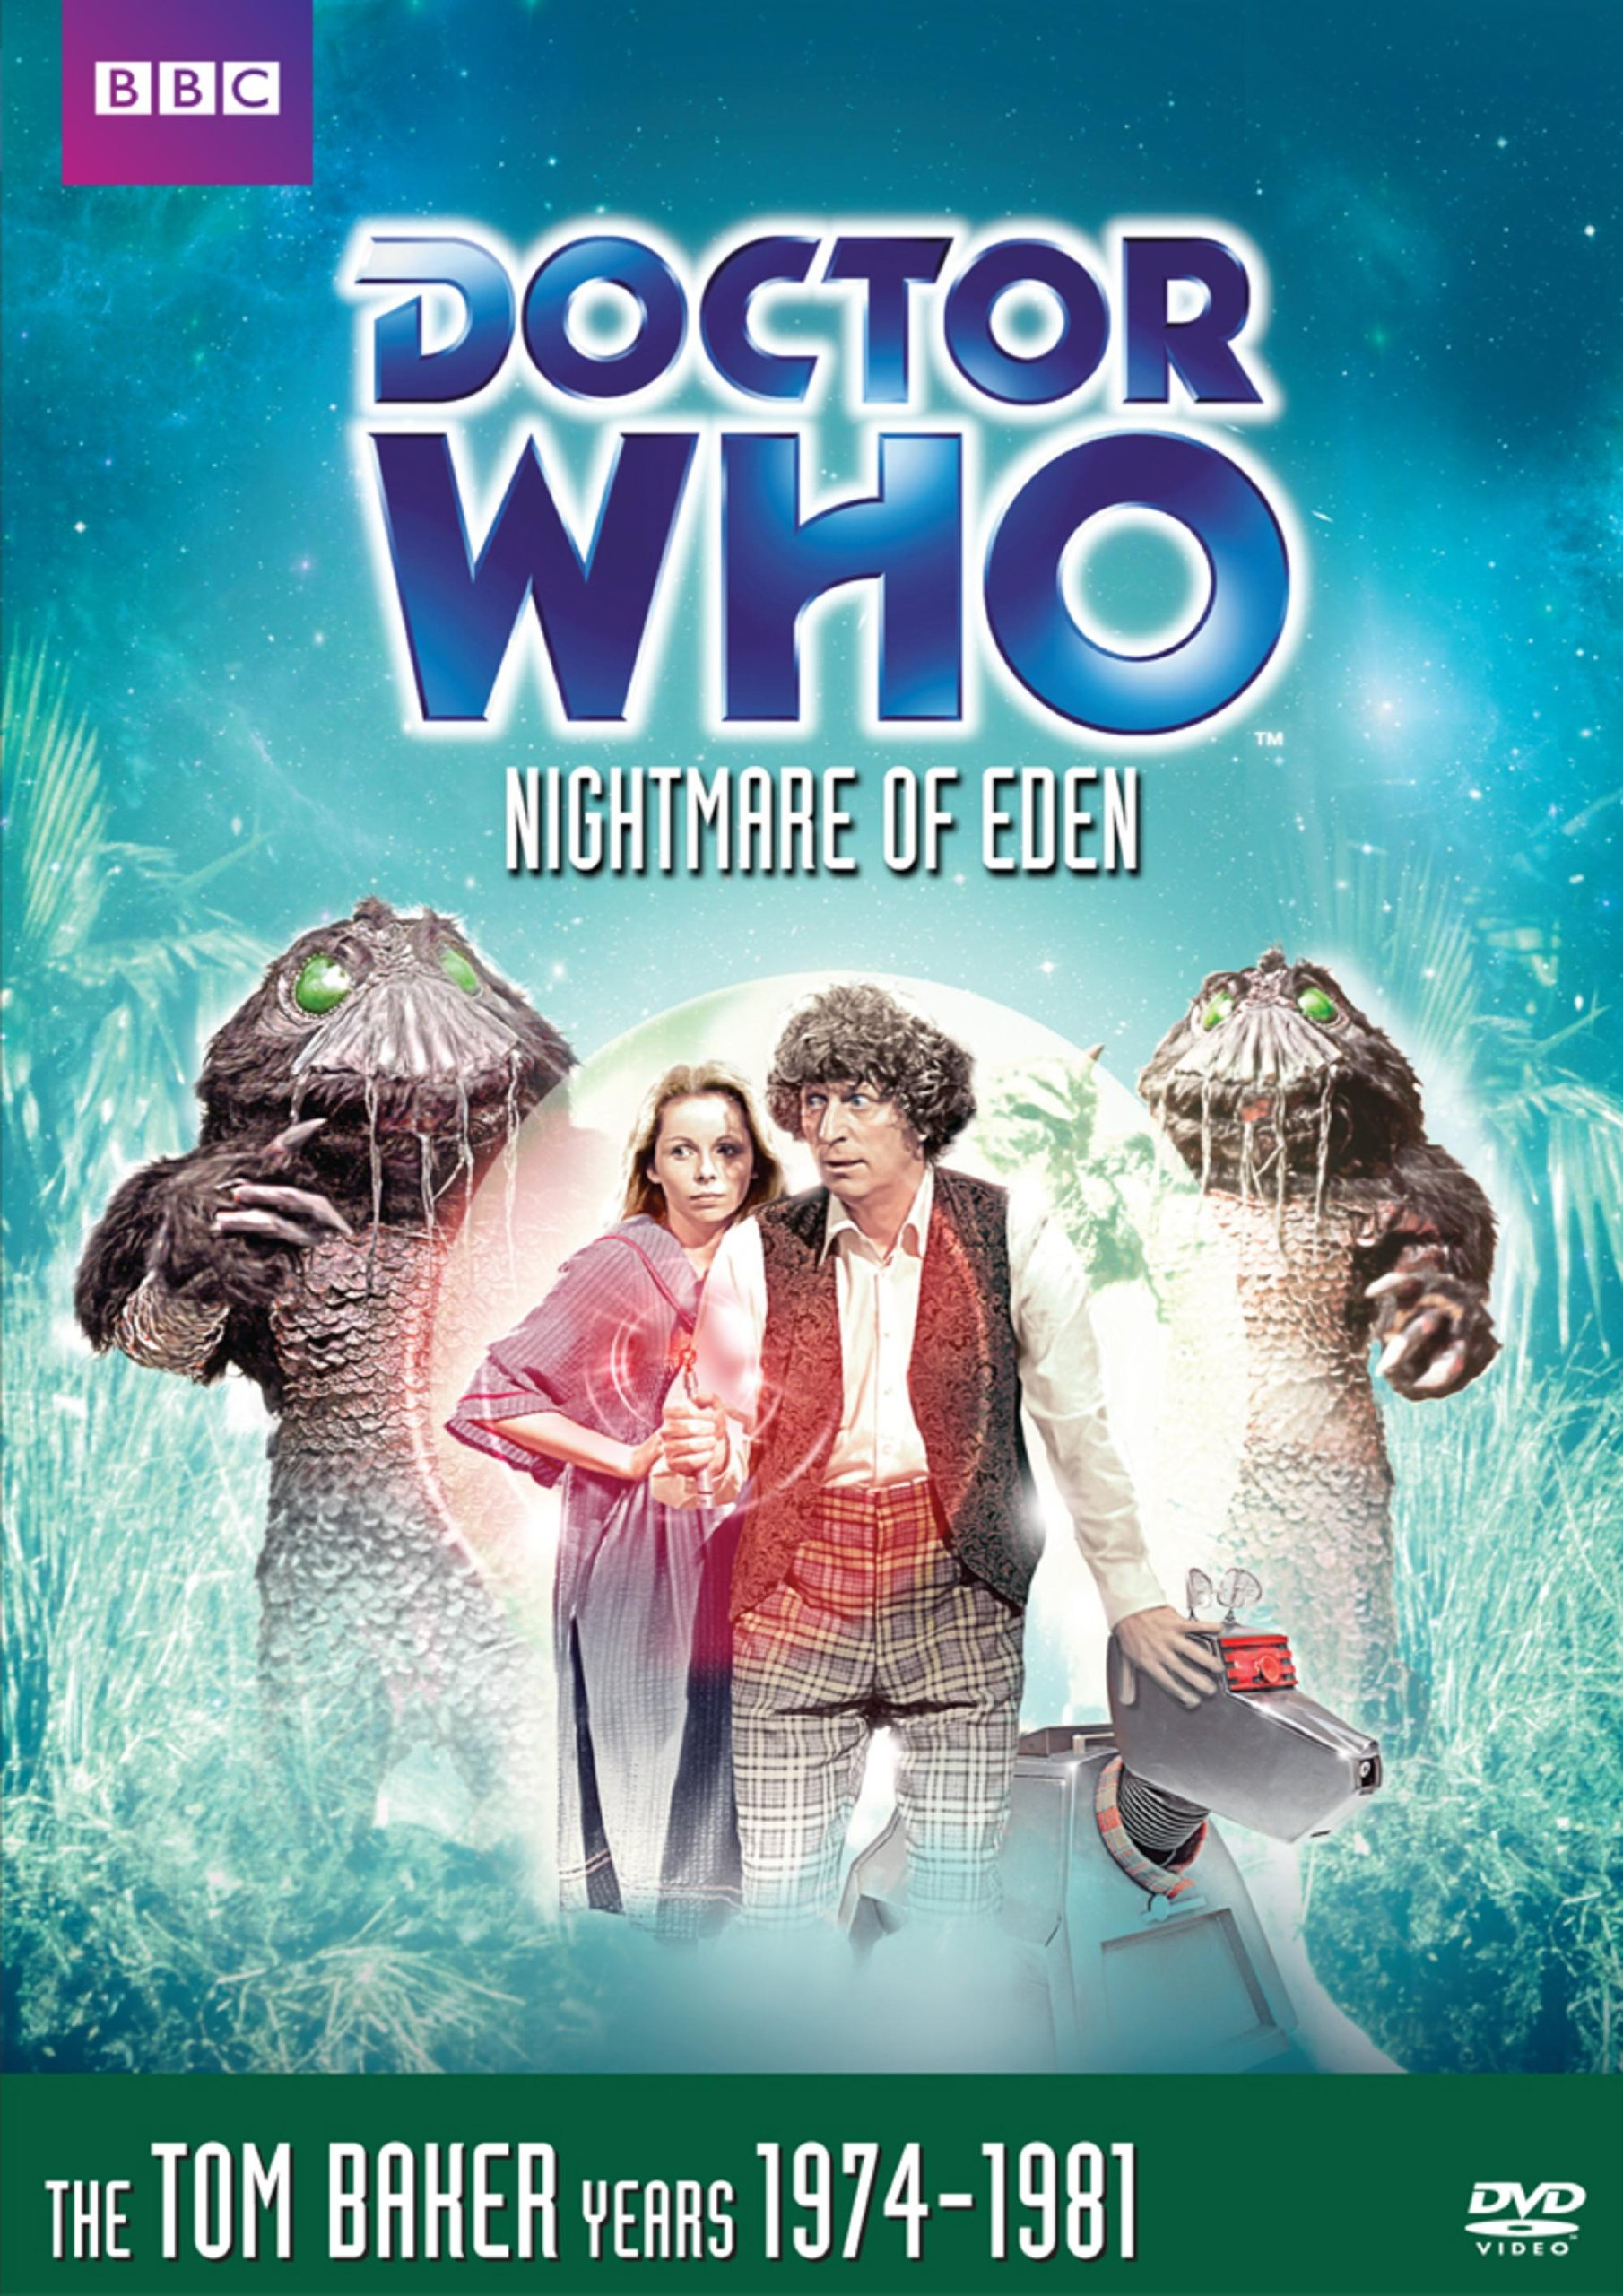 Doctor Who: Nightmare of Eden (Story 107)